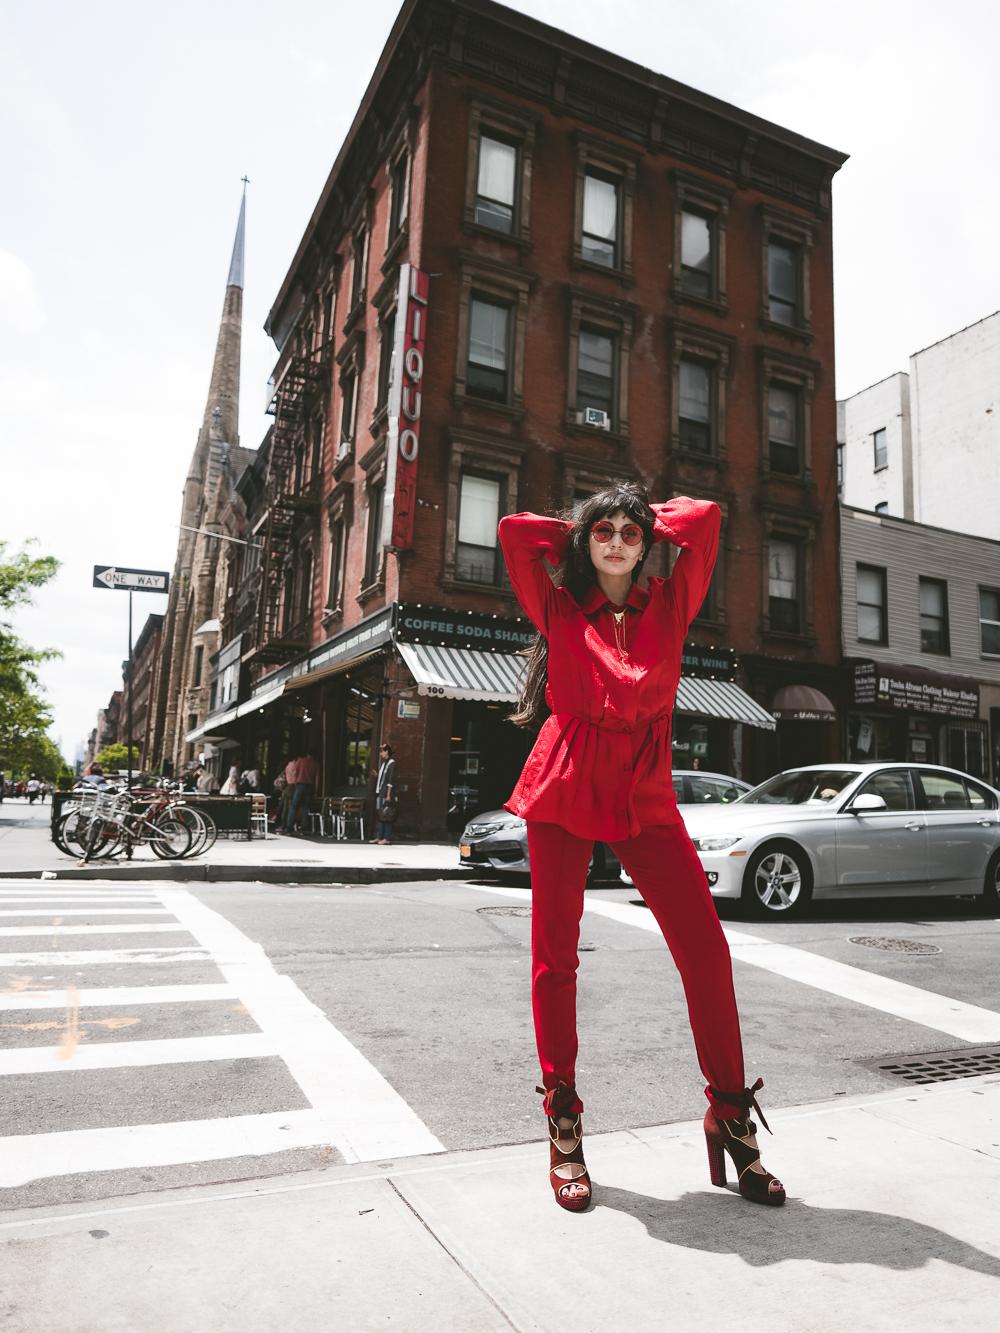 Zara Martin Harlem NYC New York City Olympus PEN E-PL9